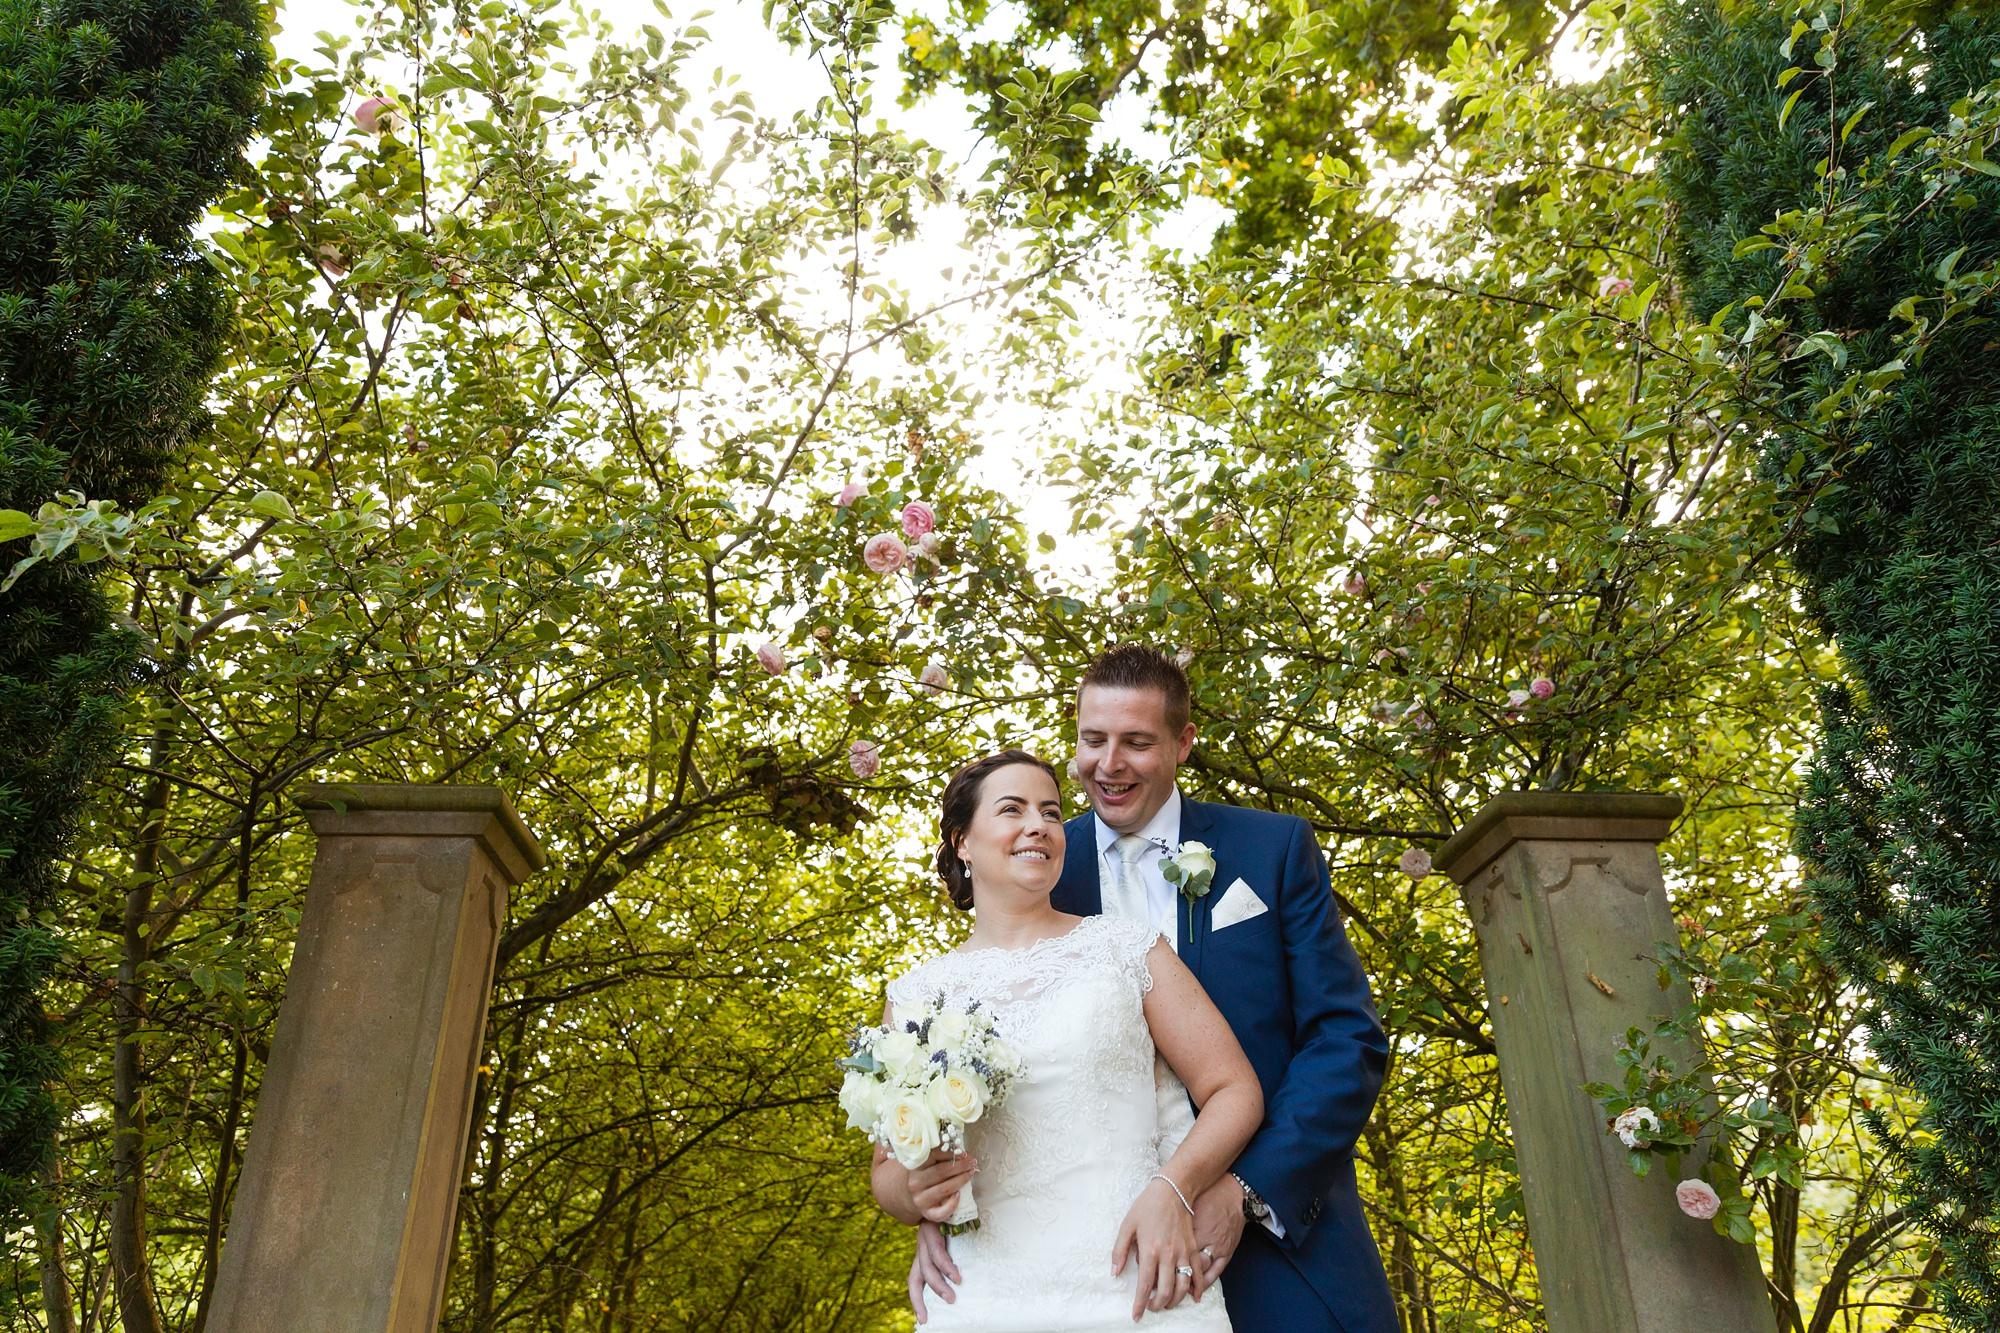 Yorkshire Wedding photography couples portrait